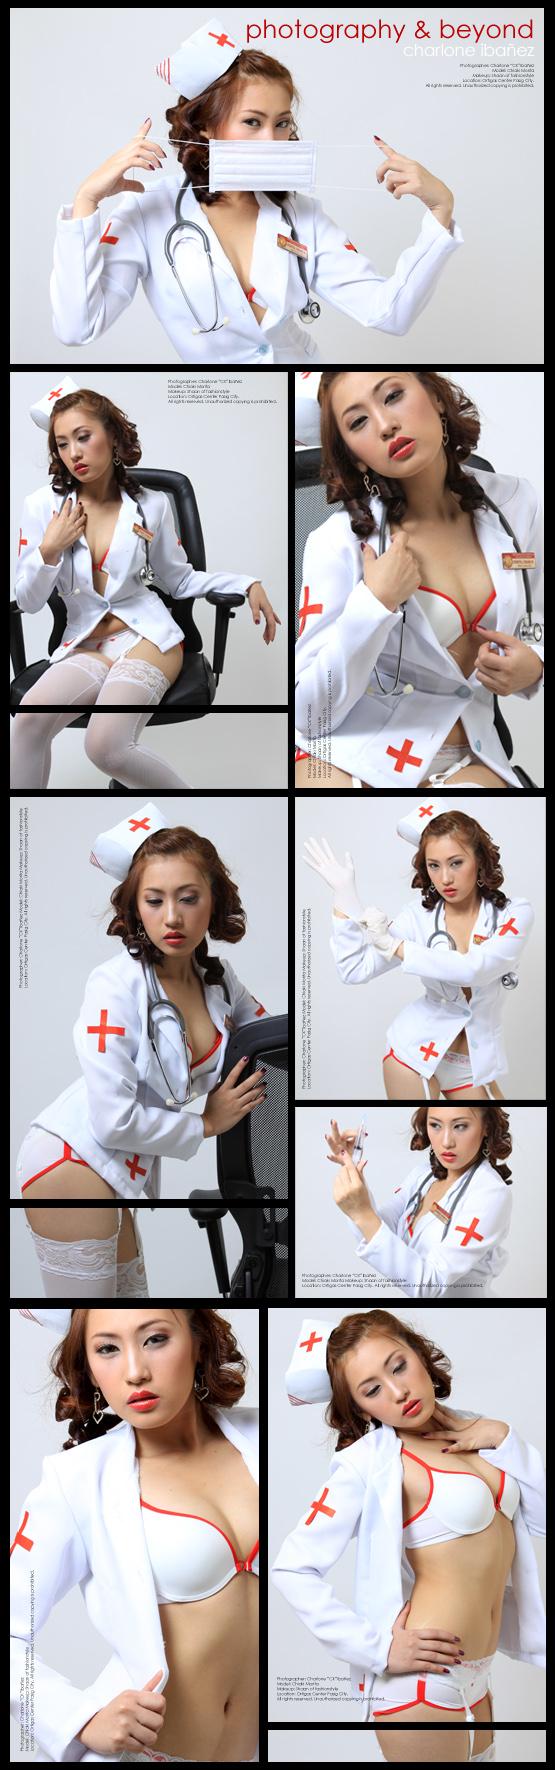 Mar 24, 2009 Charlone CK Ibañez Nurse Aki - Model: Chiaki Morita; MUA: Shaan of fashionstyle.multiply.com